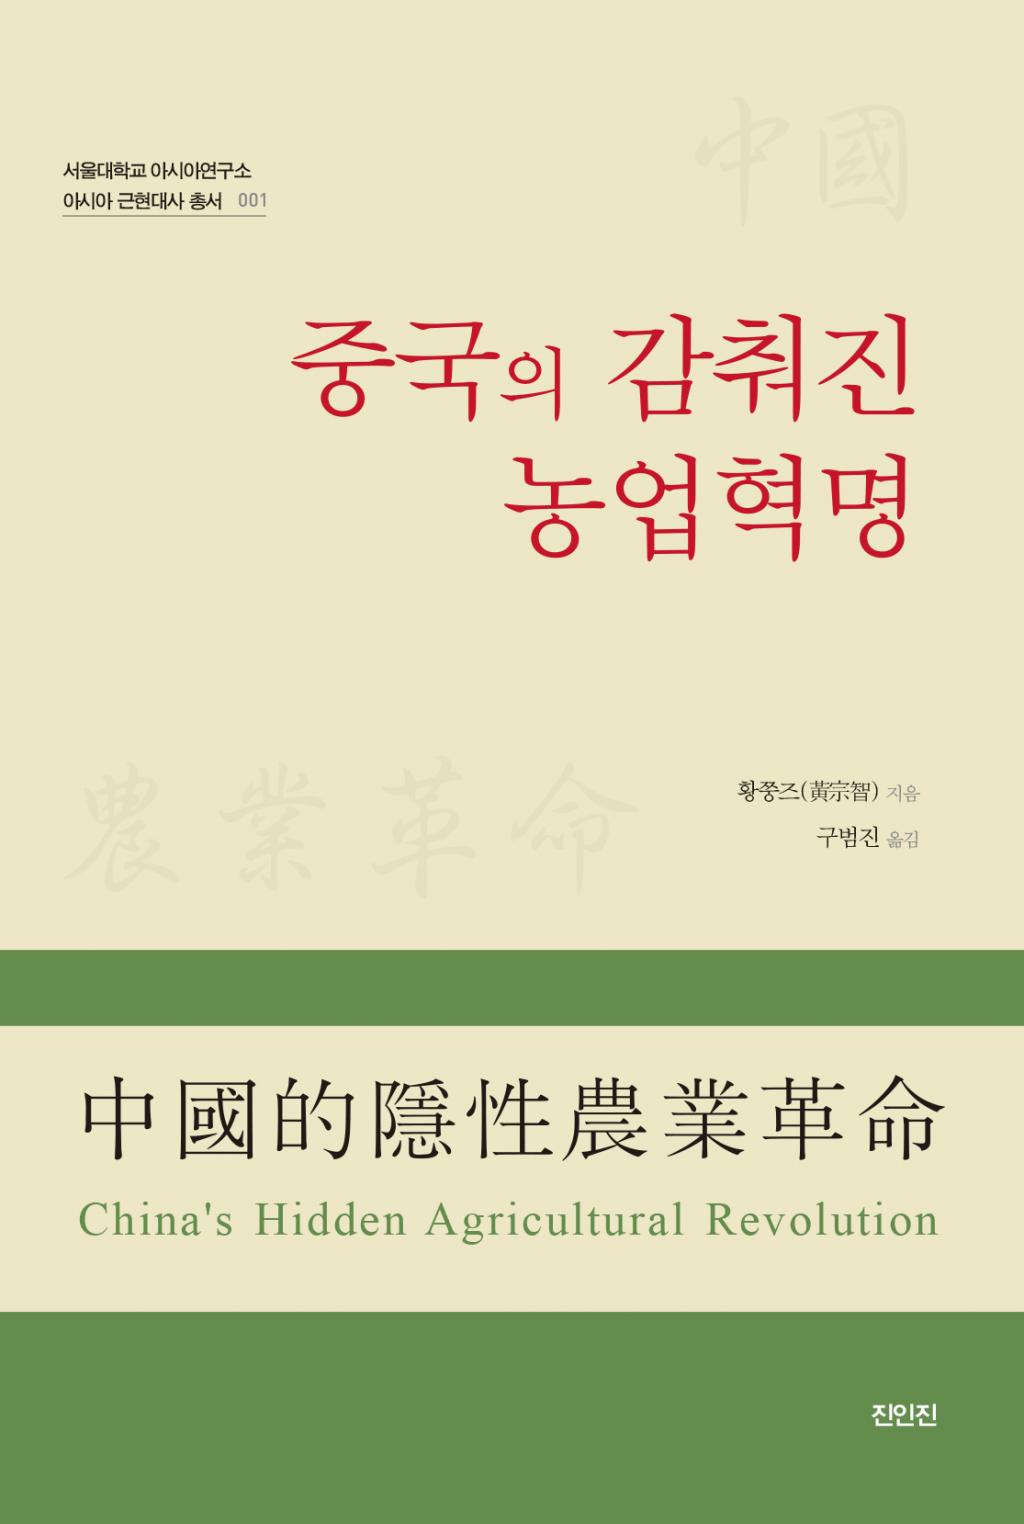 China's Hidden Agricultural Revolution